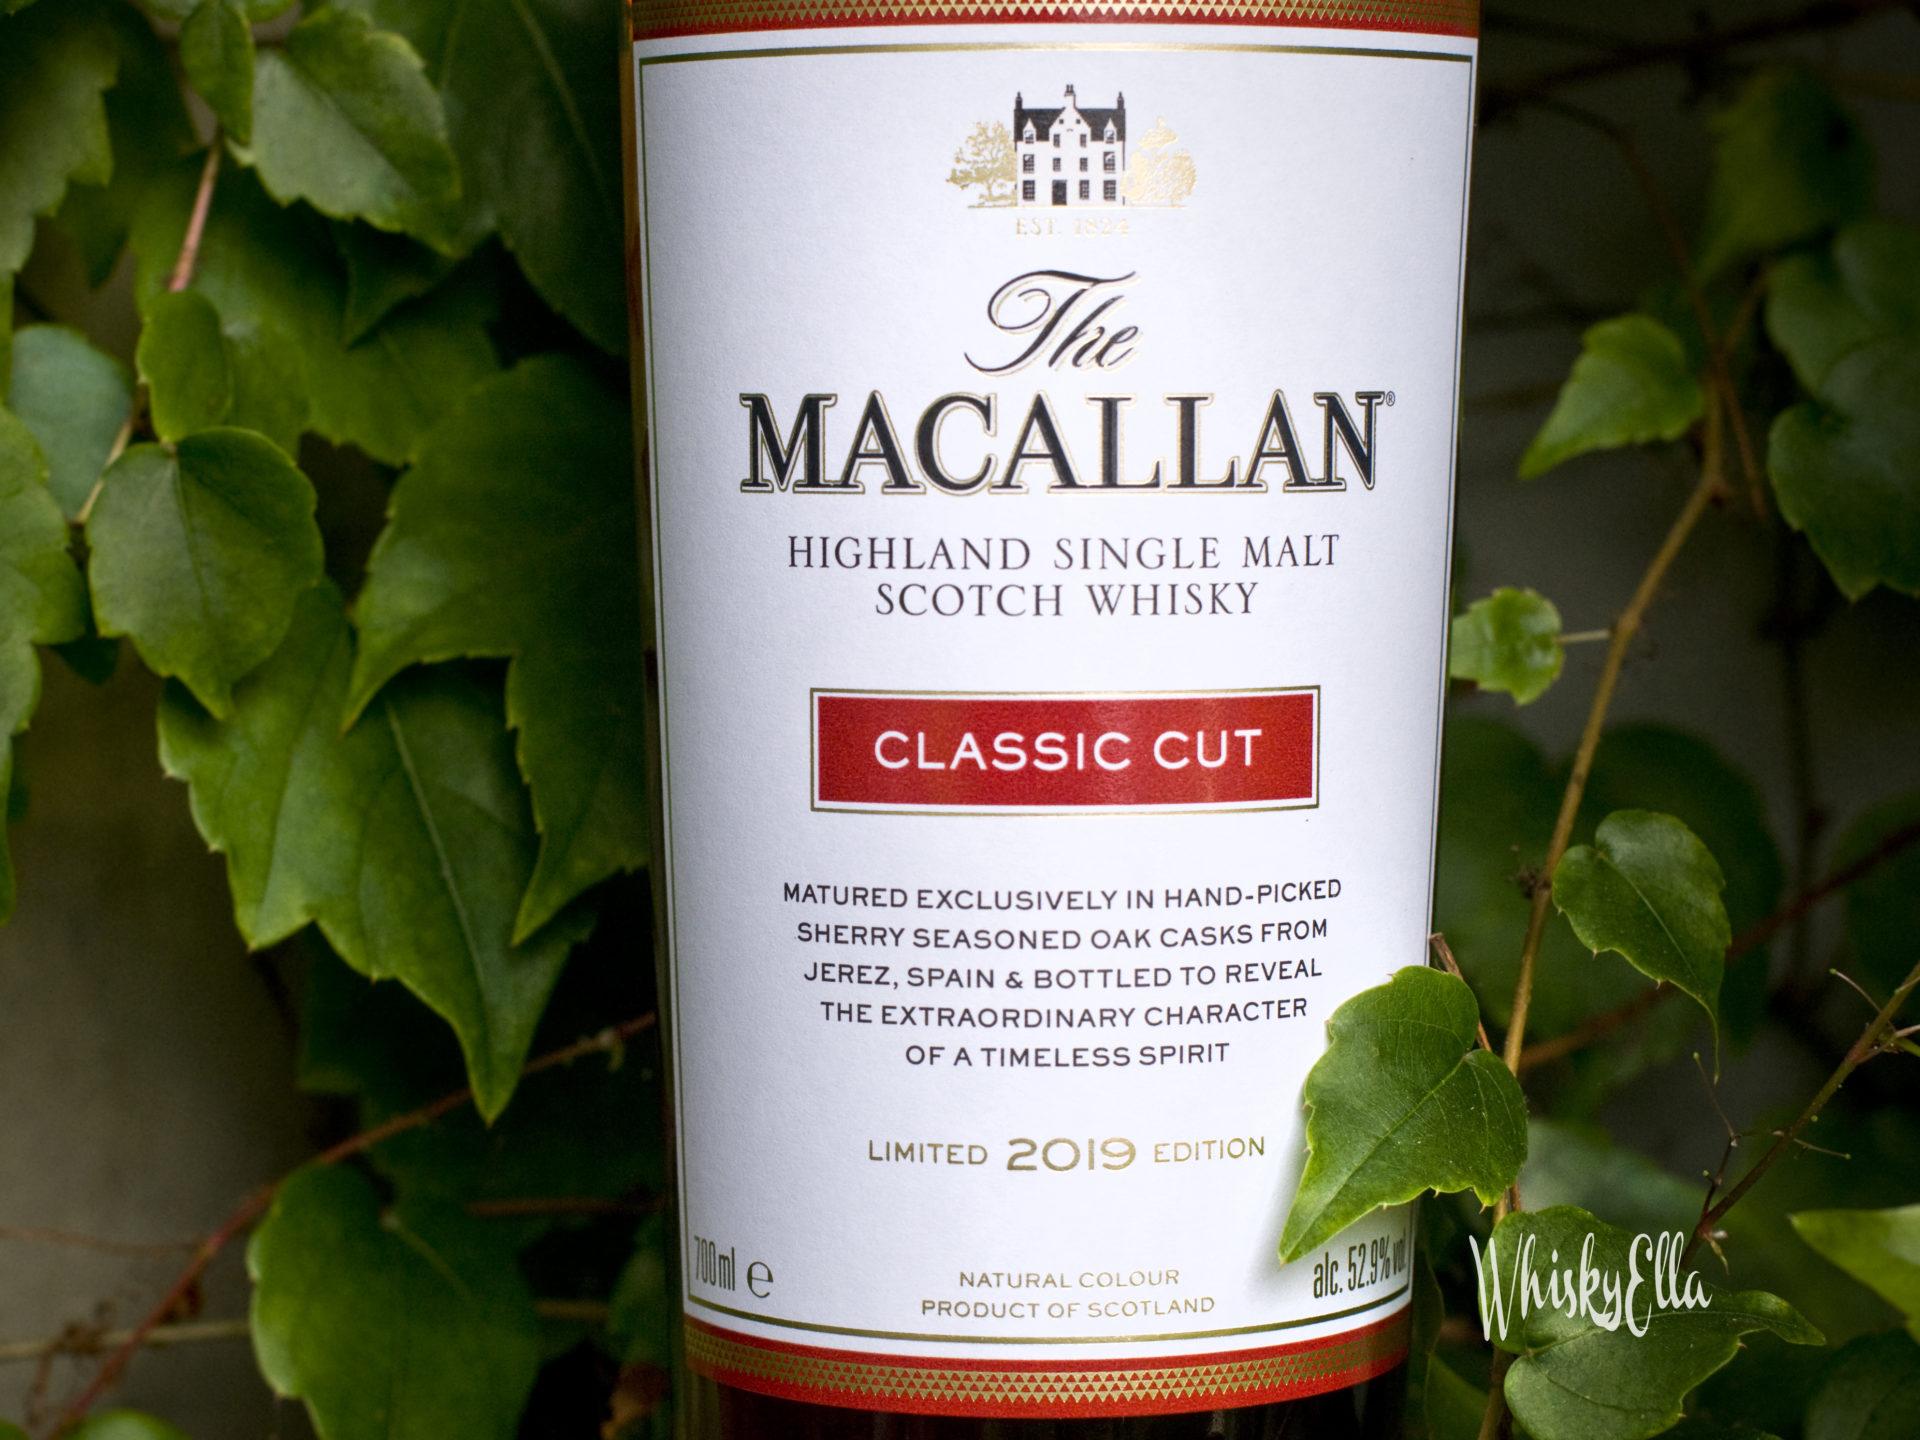 Nasza recenzja The Macallan Classic Cut 2019 Edition #35